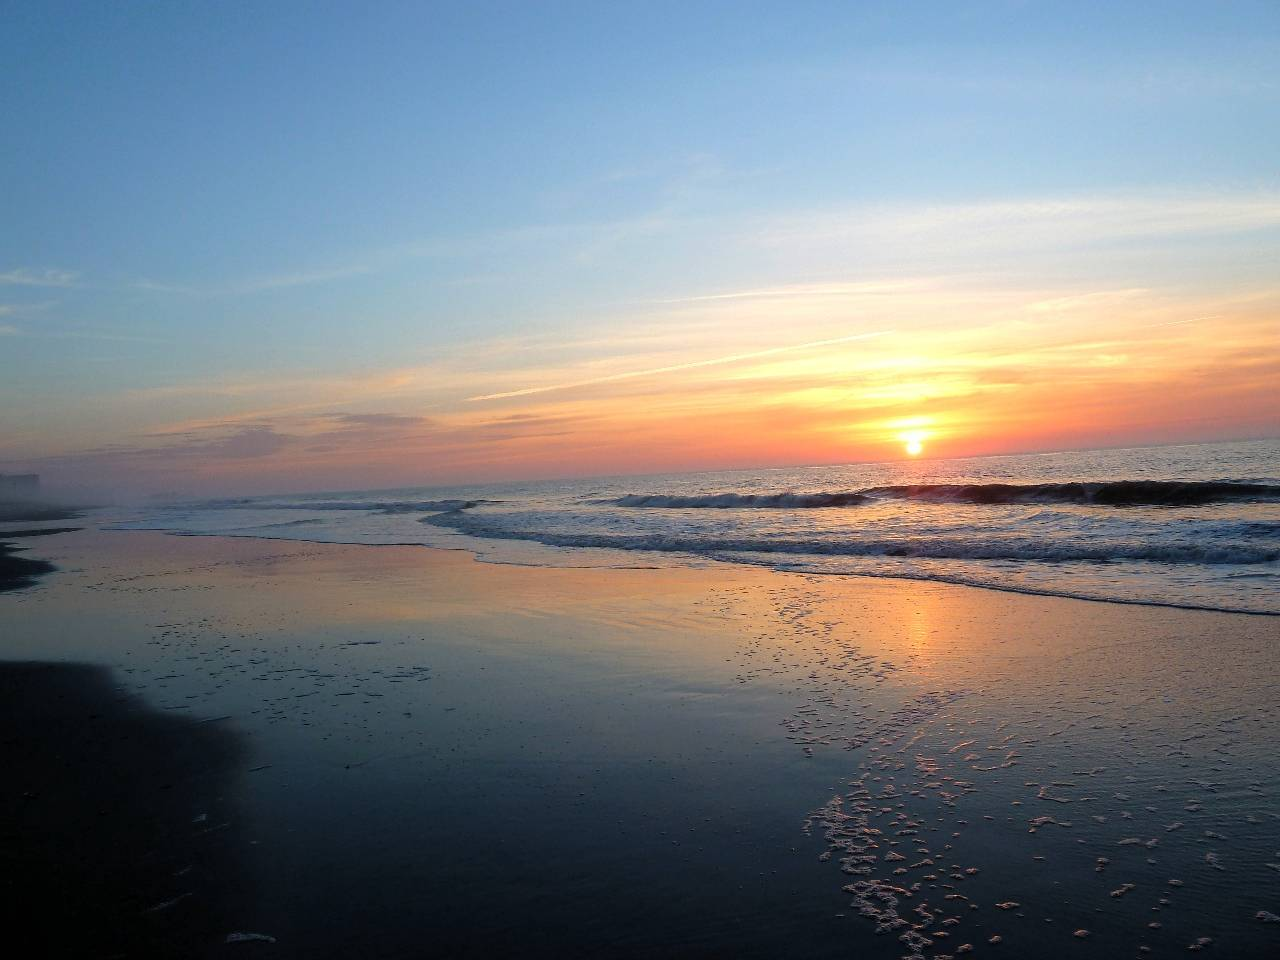 восход солнца над Океаном фотография Sergei